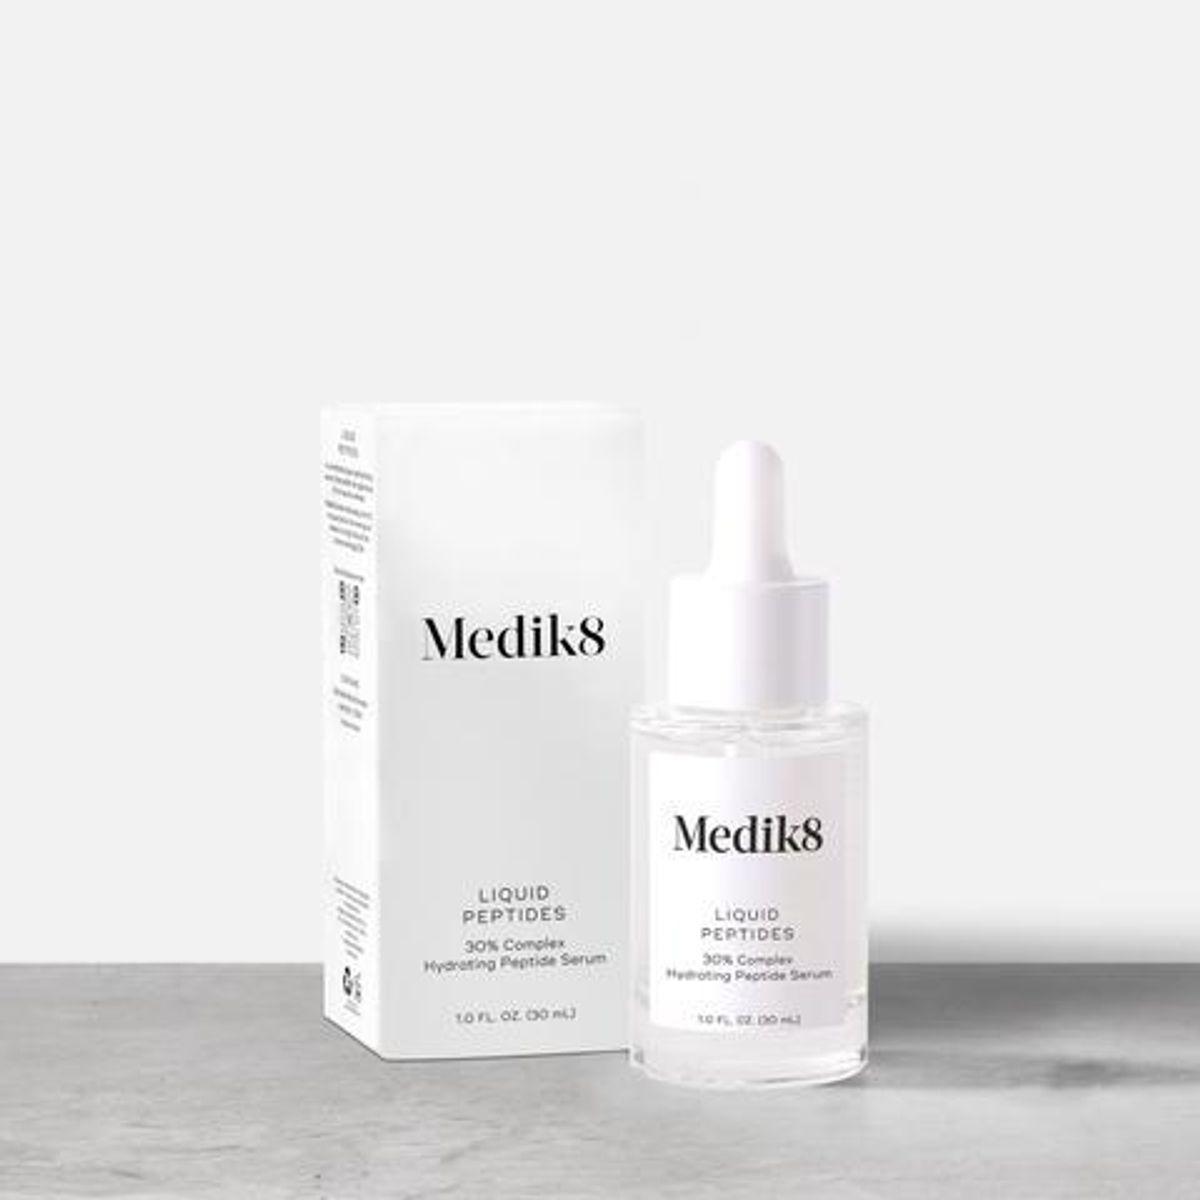 medik8 liquid peptides